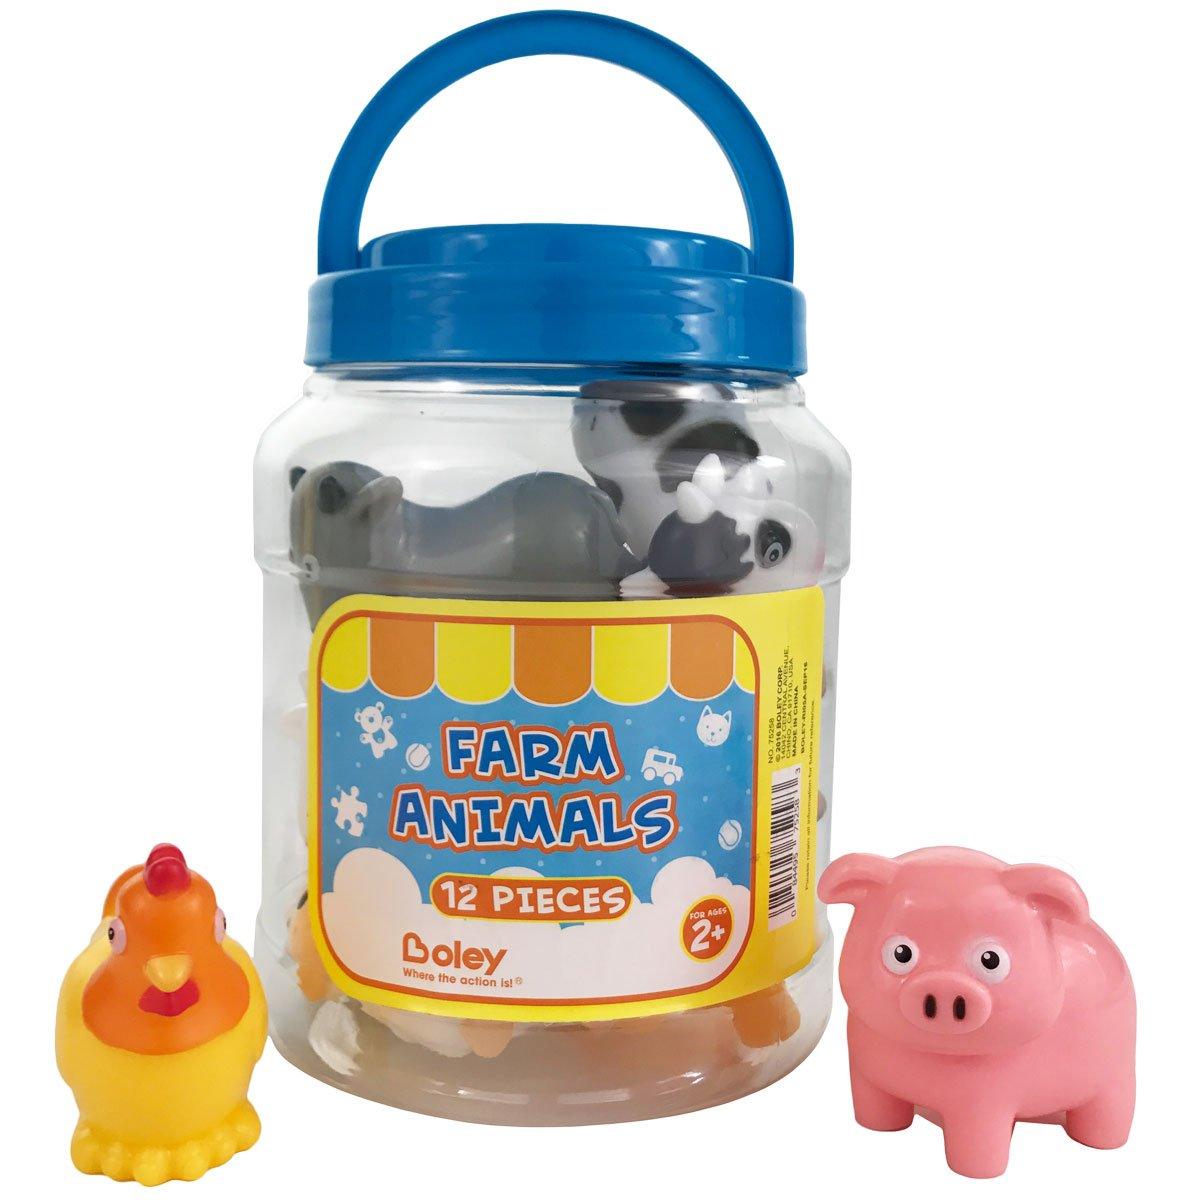 Amazon.com: BOLEY (12-Piece) Farm Animal Bath Bucket - Farm Animal ...